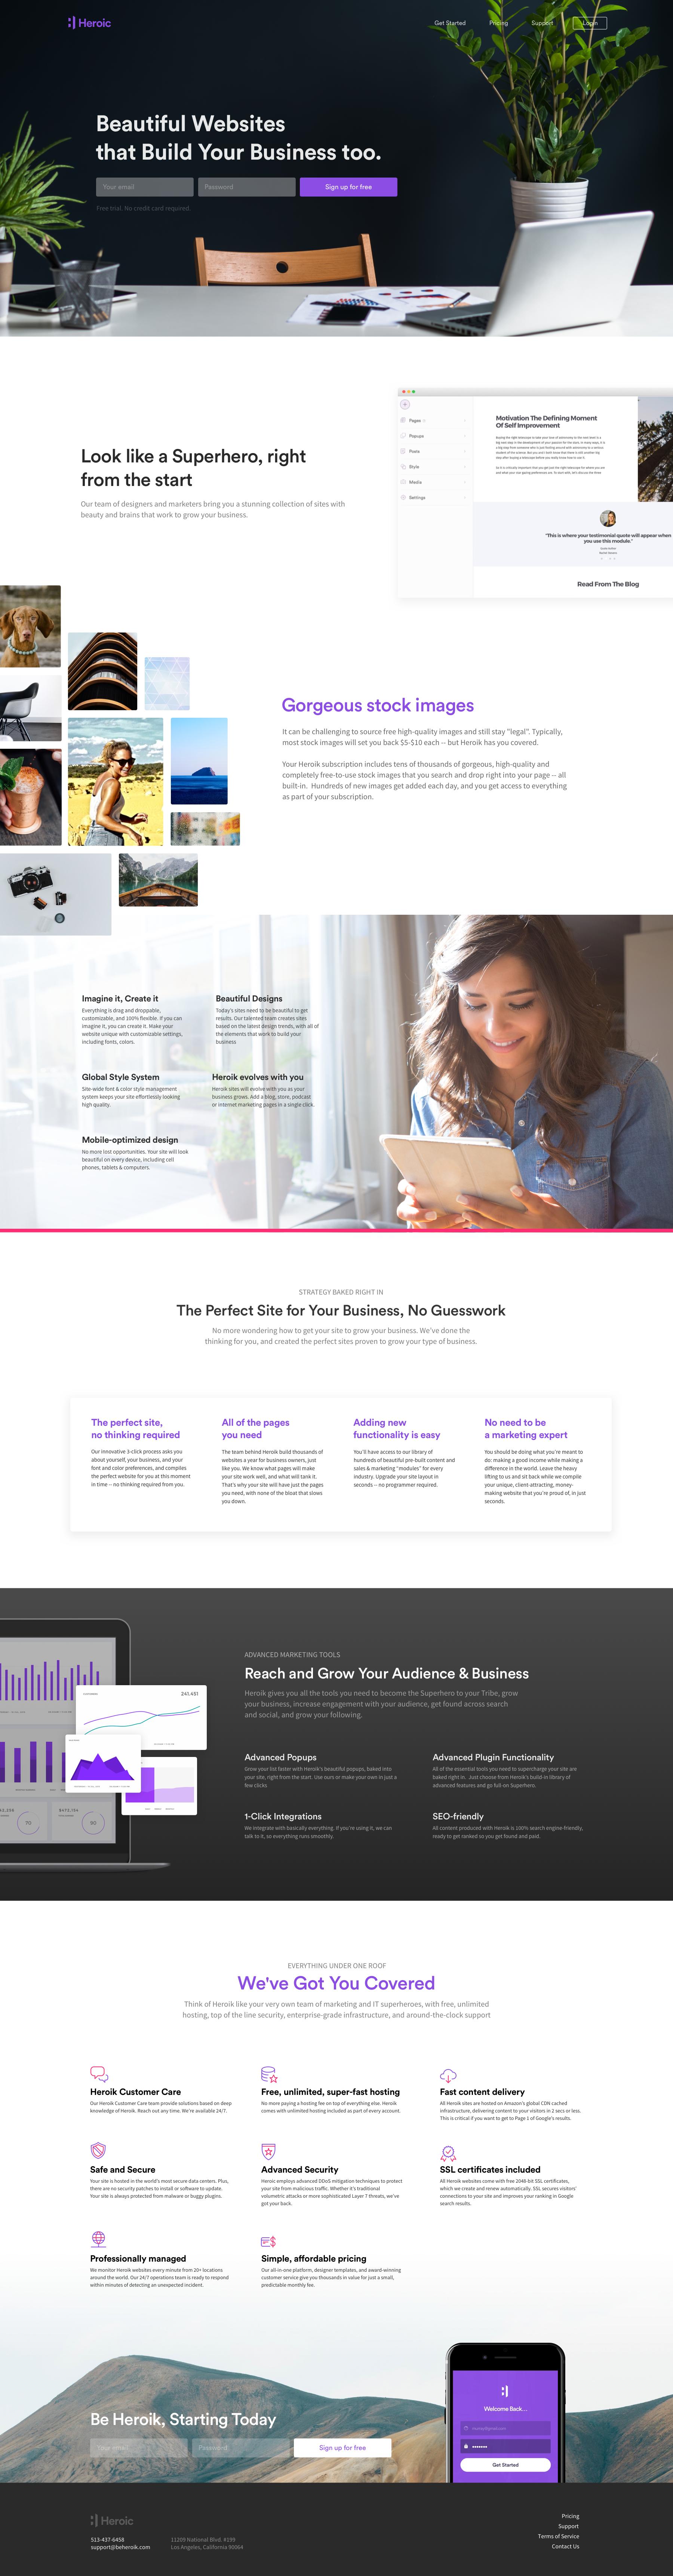 Heroik Homepage 3 Business Web Design Fun Website Design Freelance Web Design